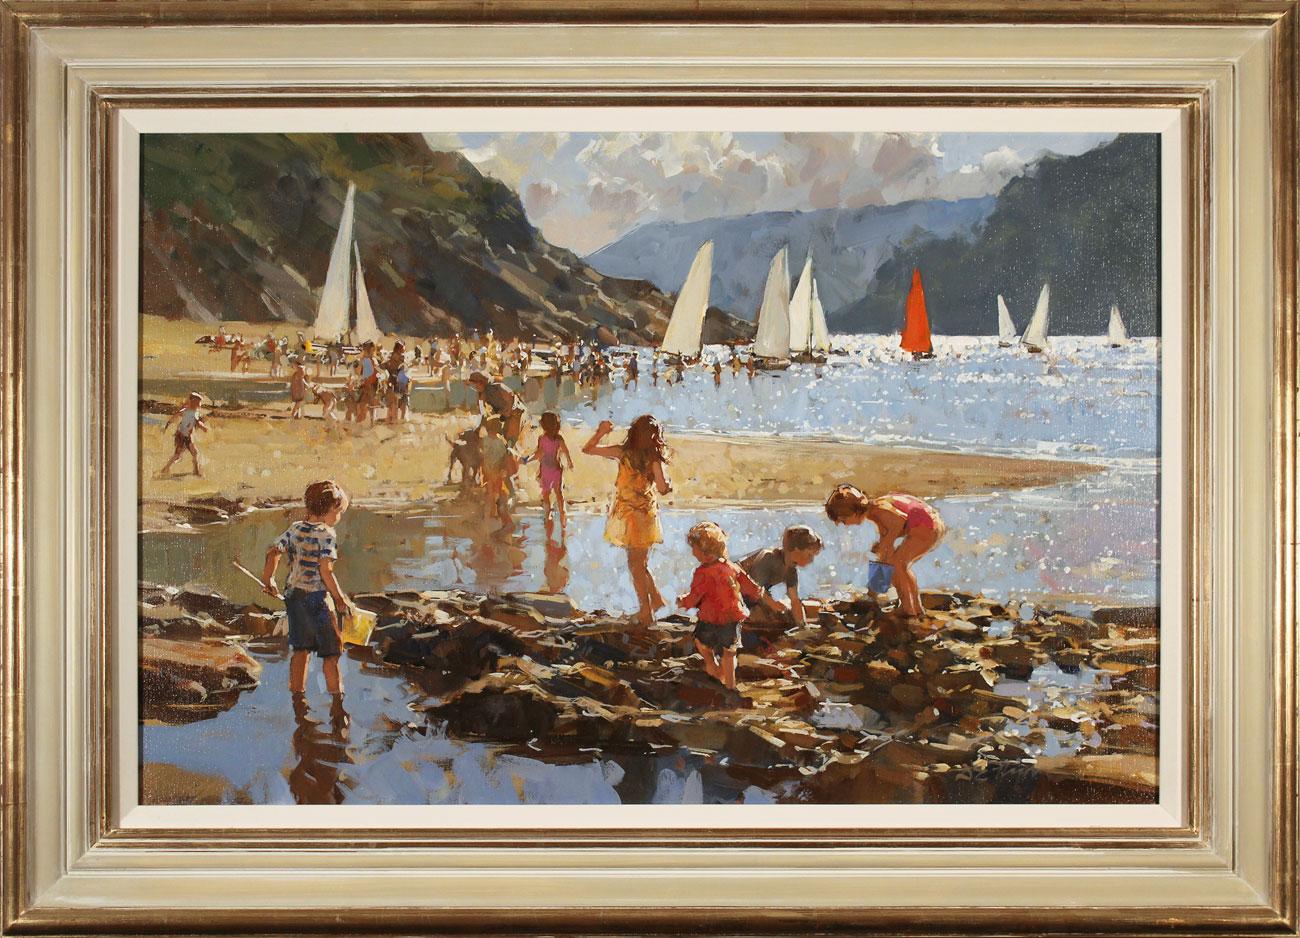 Dianne Flynn, Original acrylic painting on canvas, Ebbtide, Salcombe. Click to enlarge